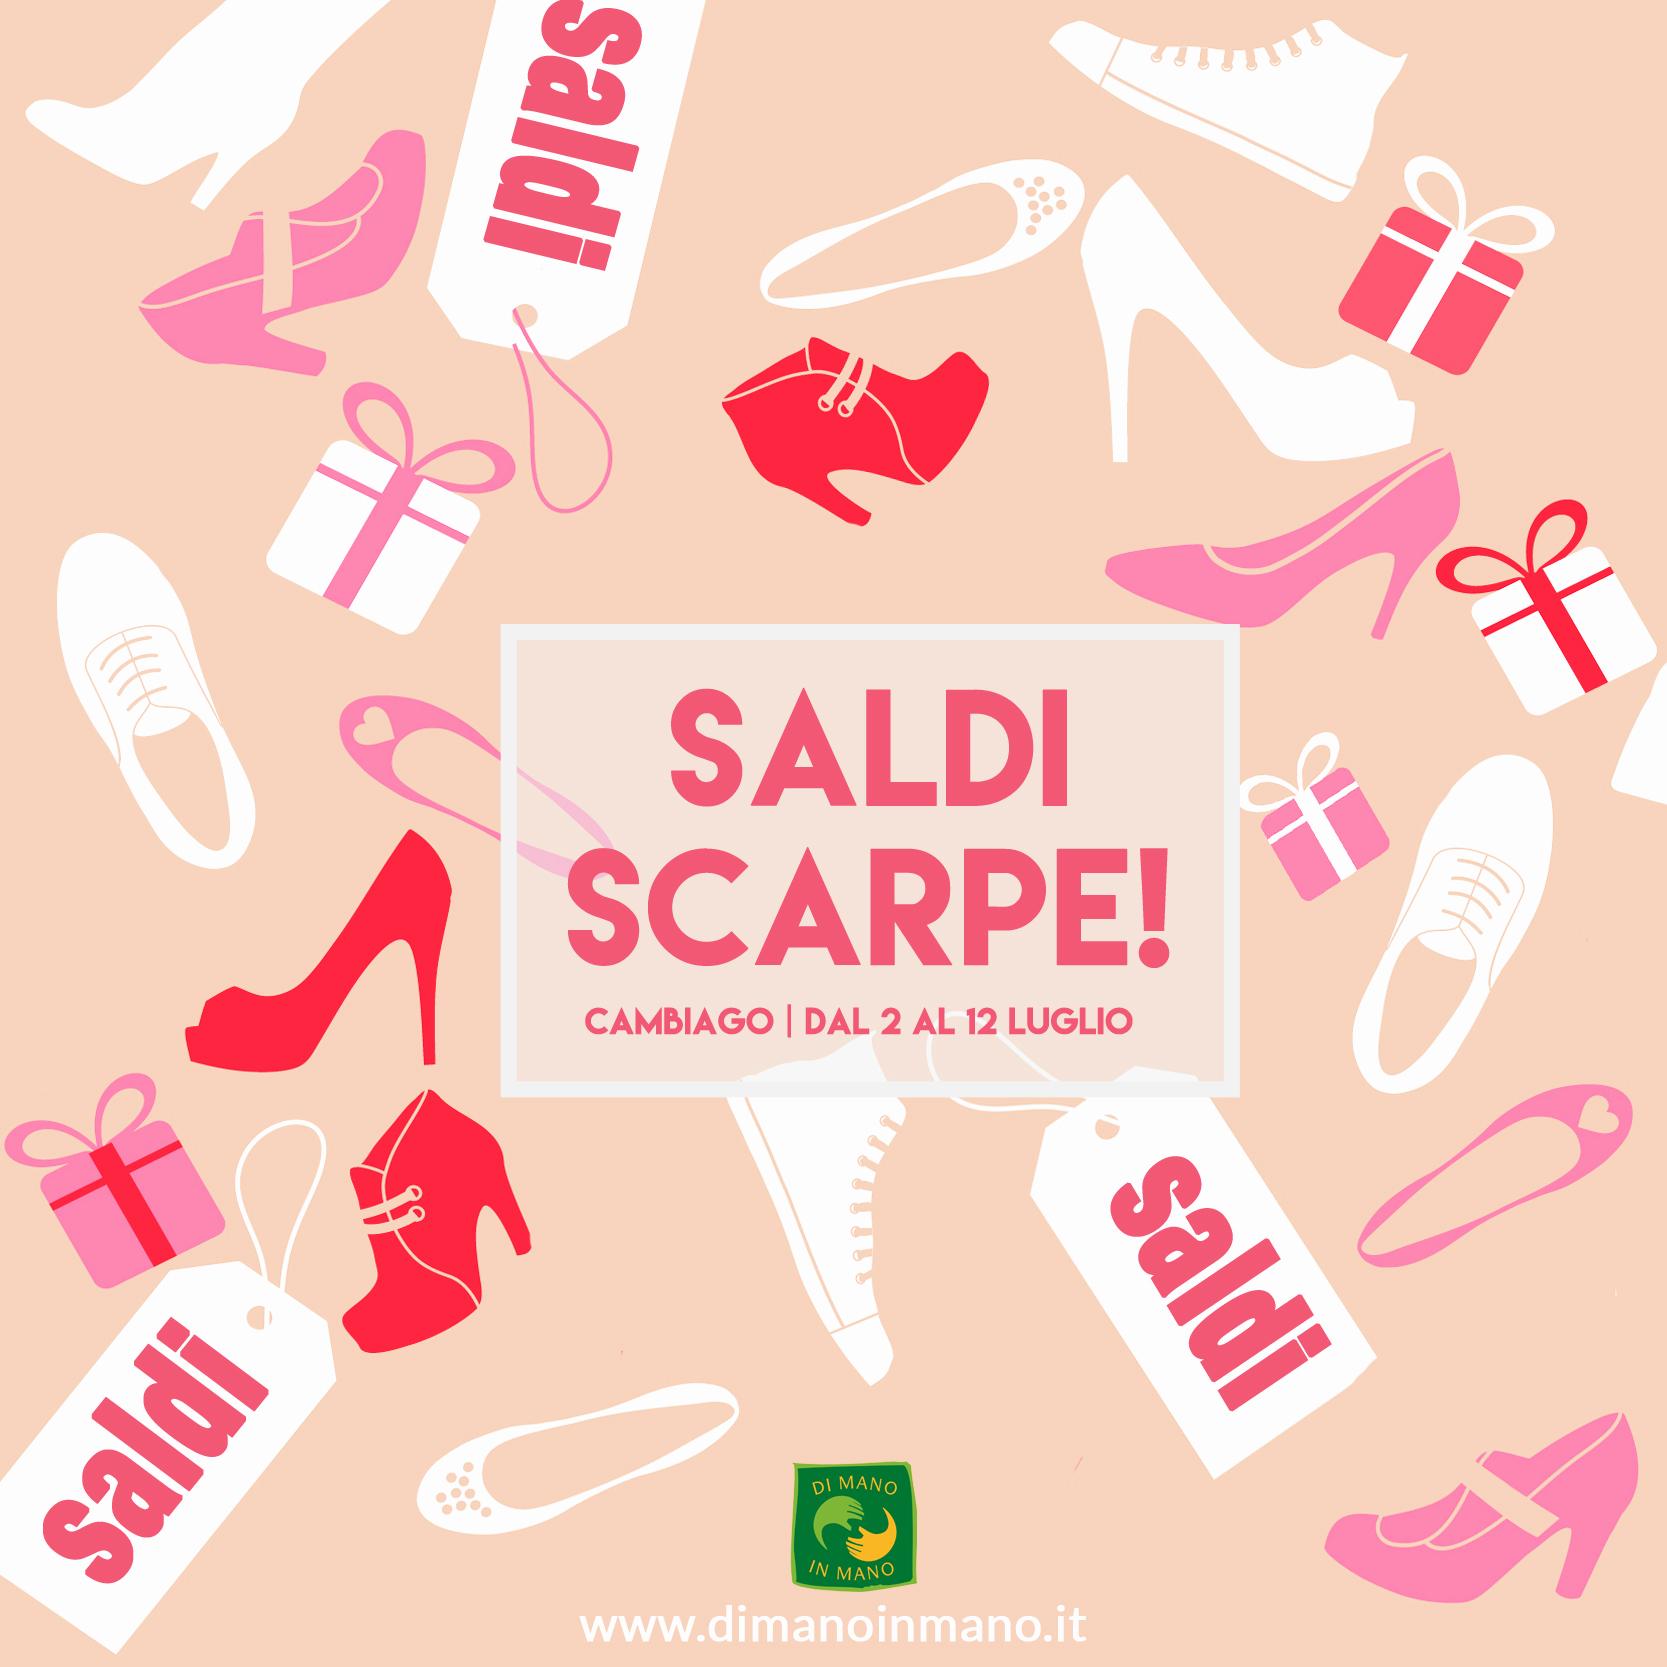 Di mano in mano saldi scarpe 2016 for Saldi mobili 2016